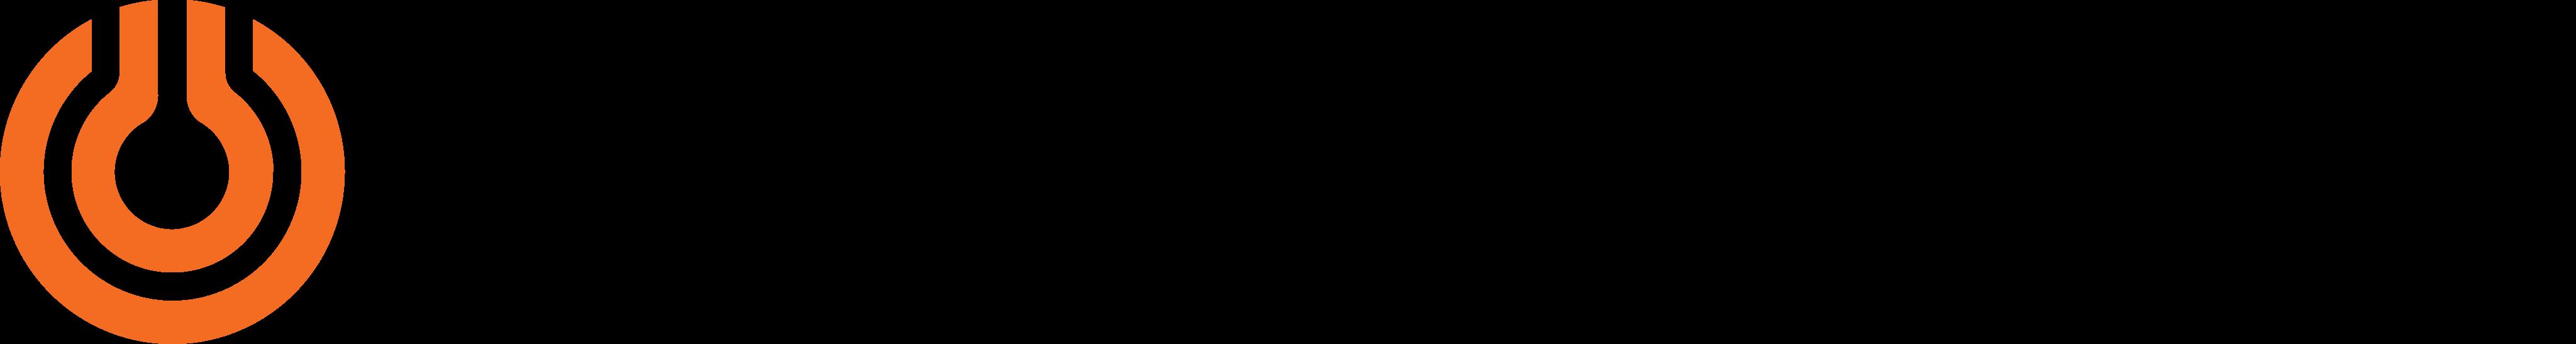 Supergasbras Logo.